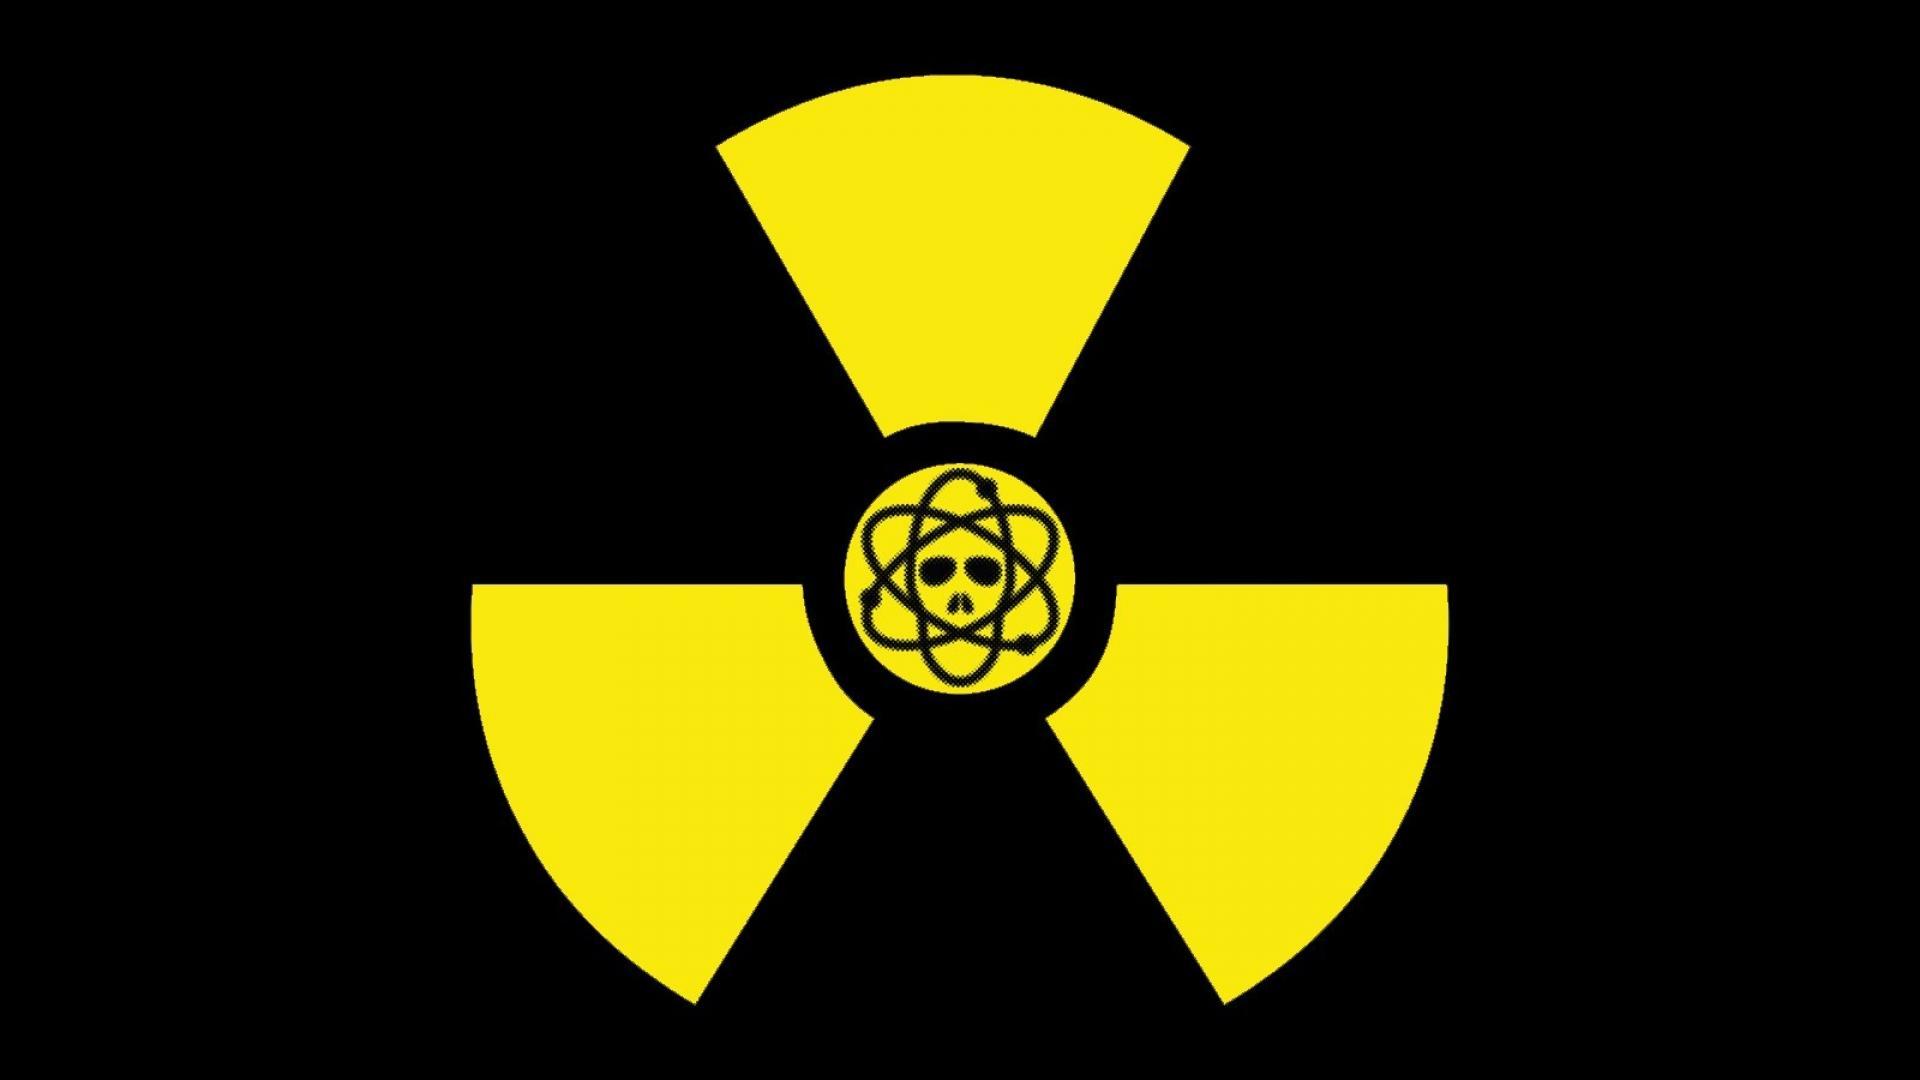 1920x1080 radiation sign symbol - photo #30